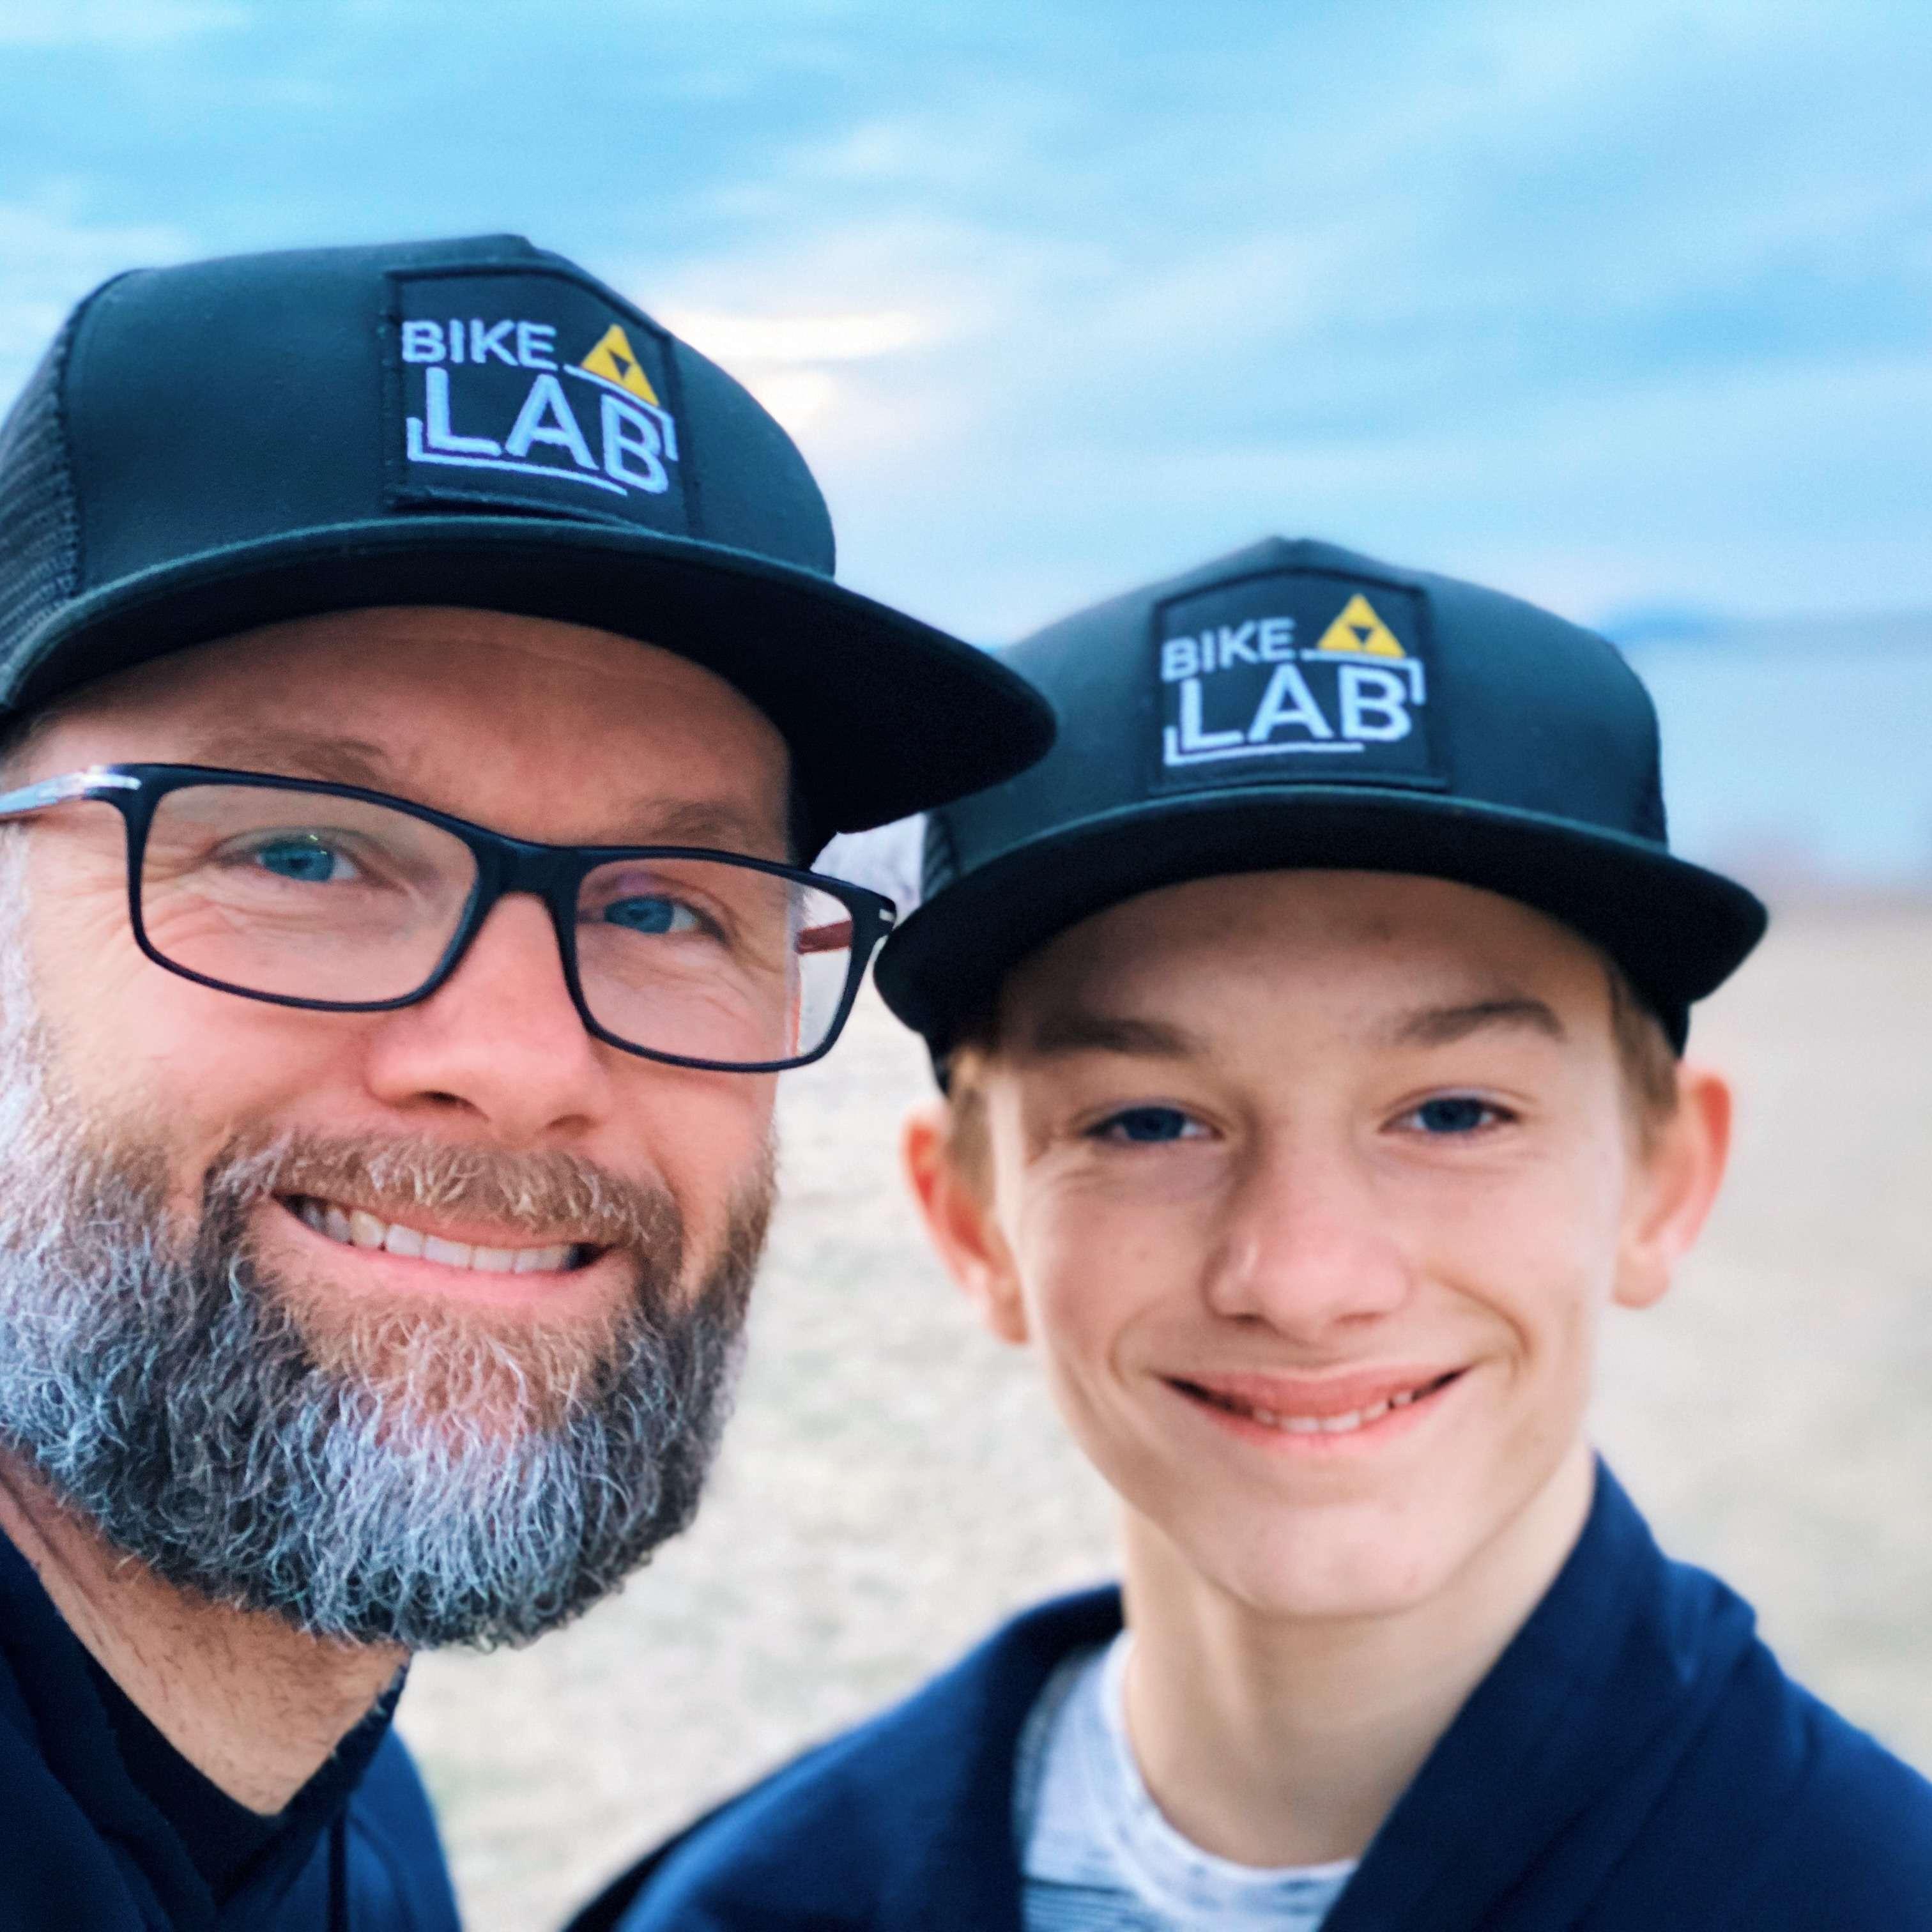 Tony and his son